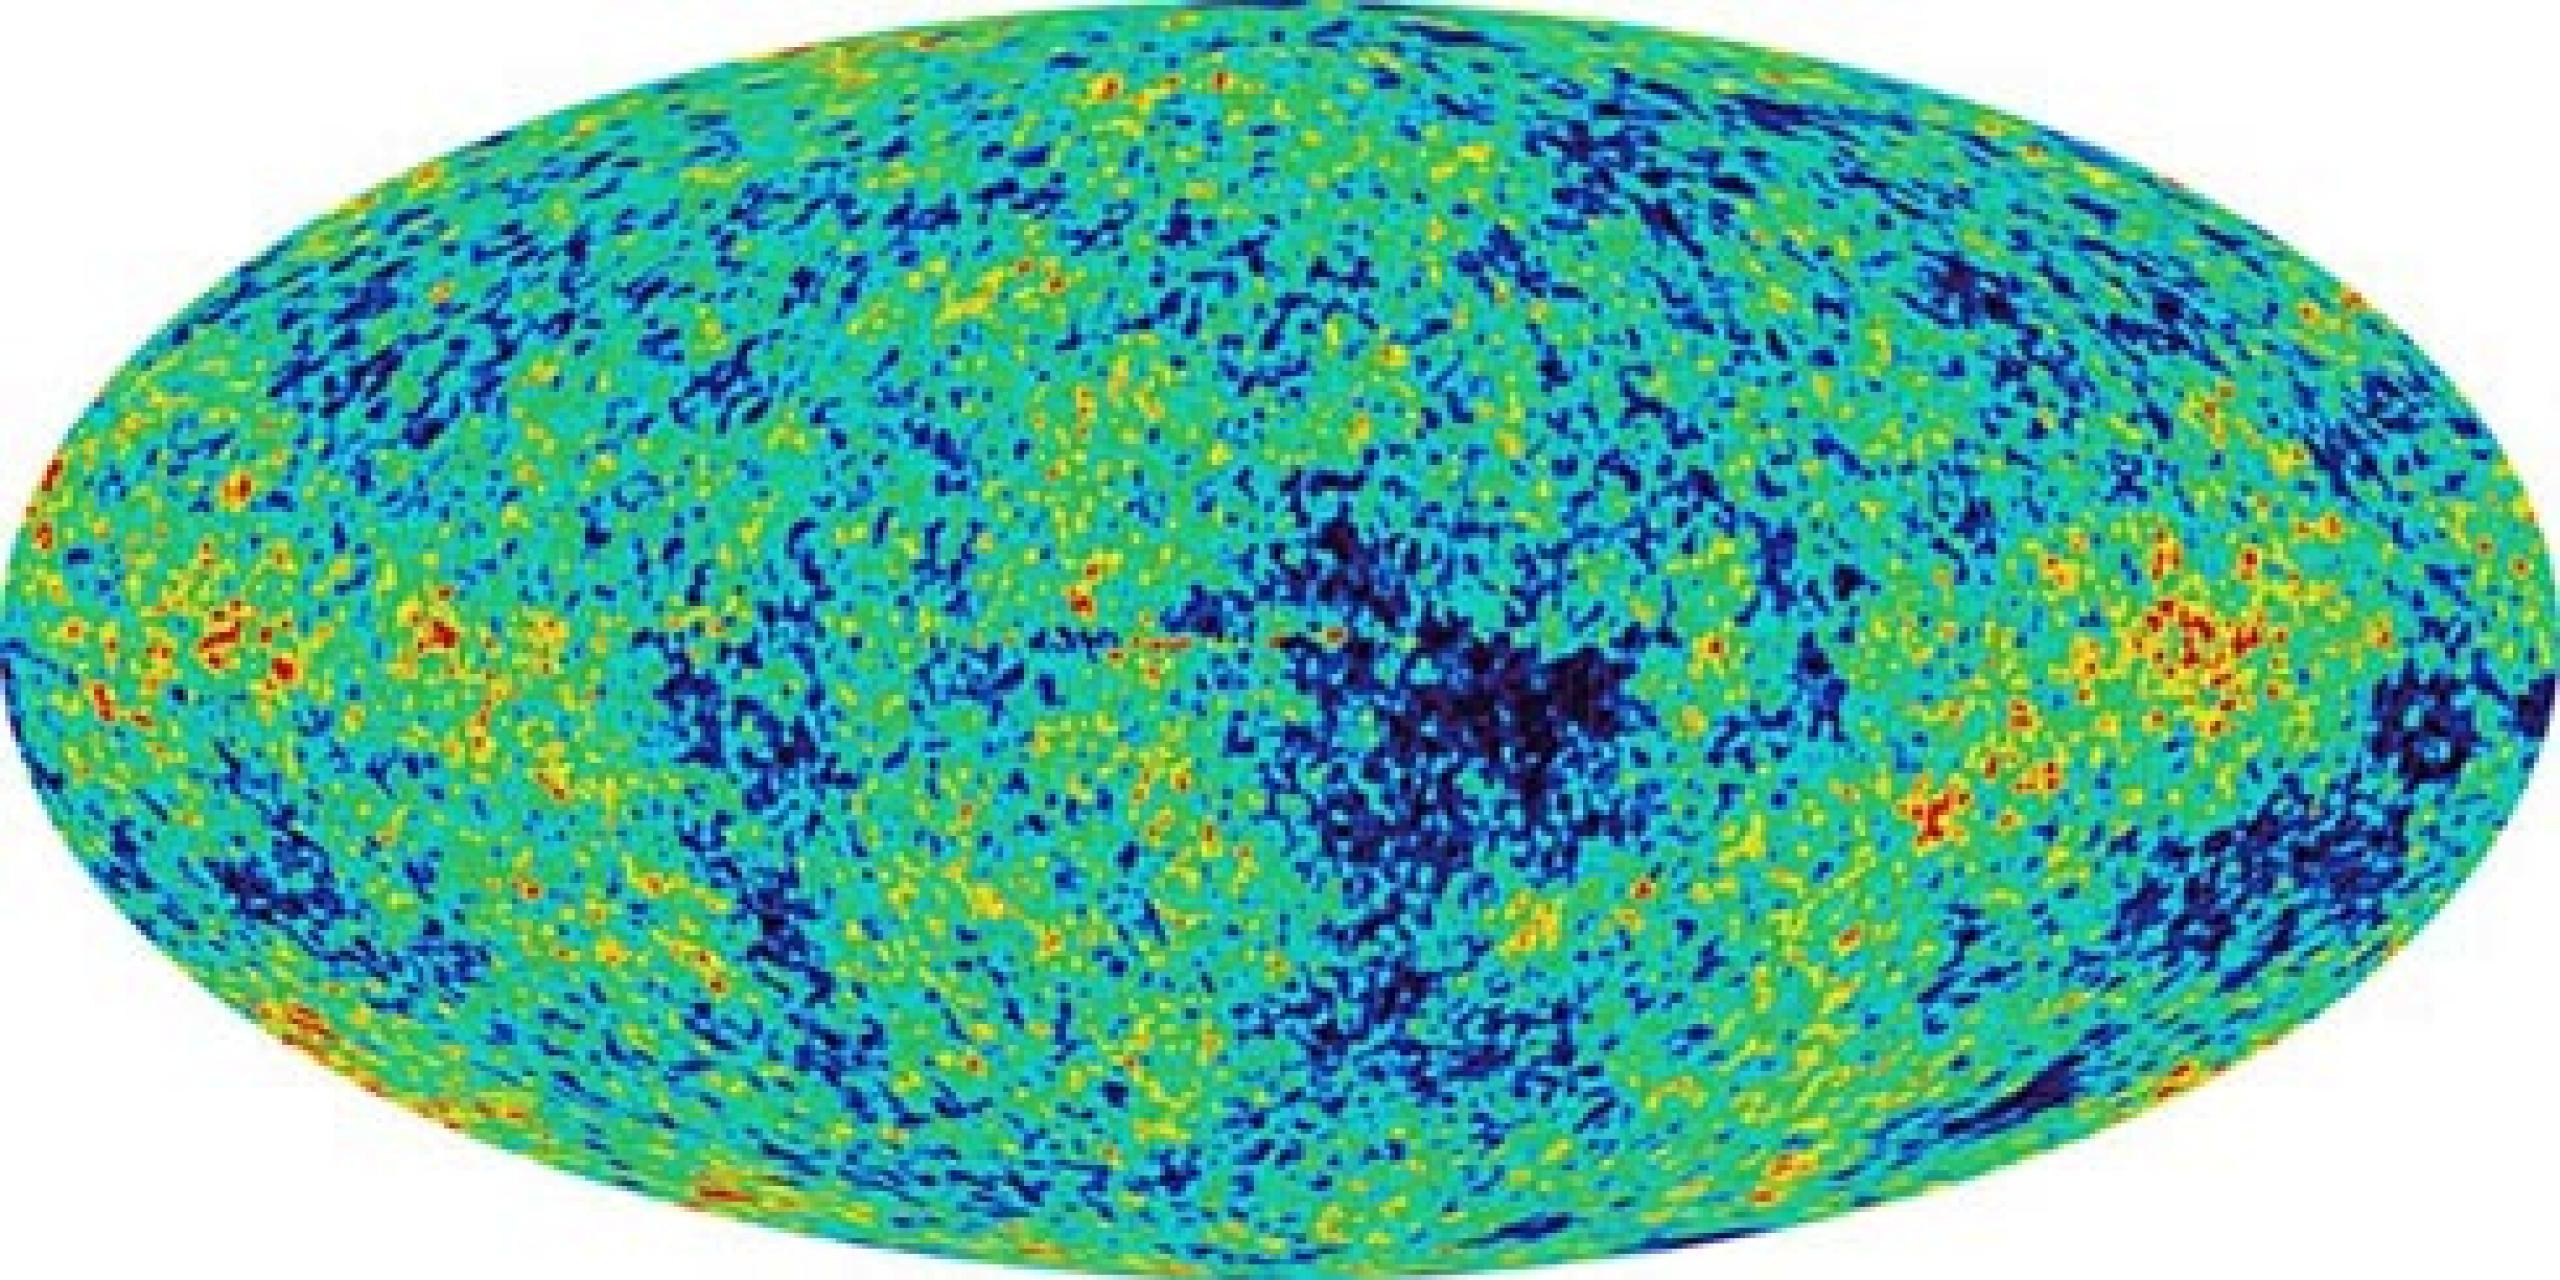 Universe Fate-1 Accelerating Universe